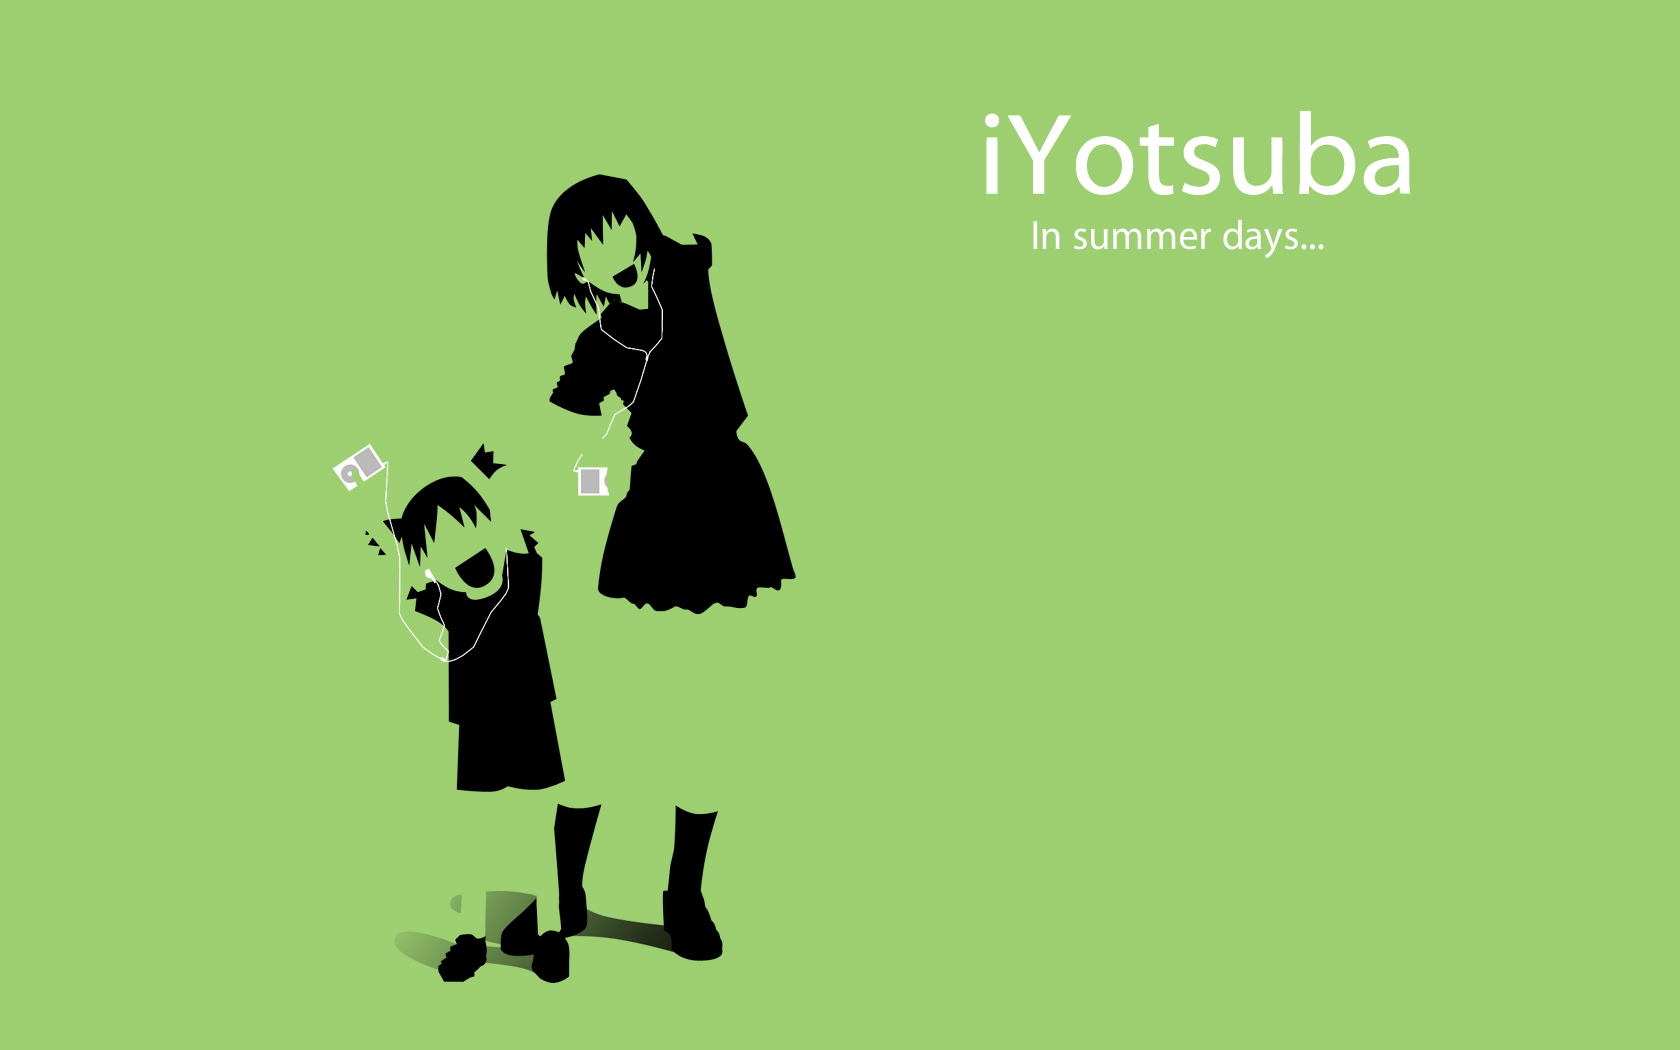 ayase_fuuka green ipod koiwai_yotsuba polychromatic silhouette yotsubato!